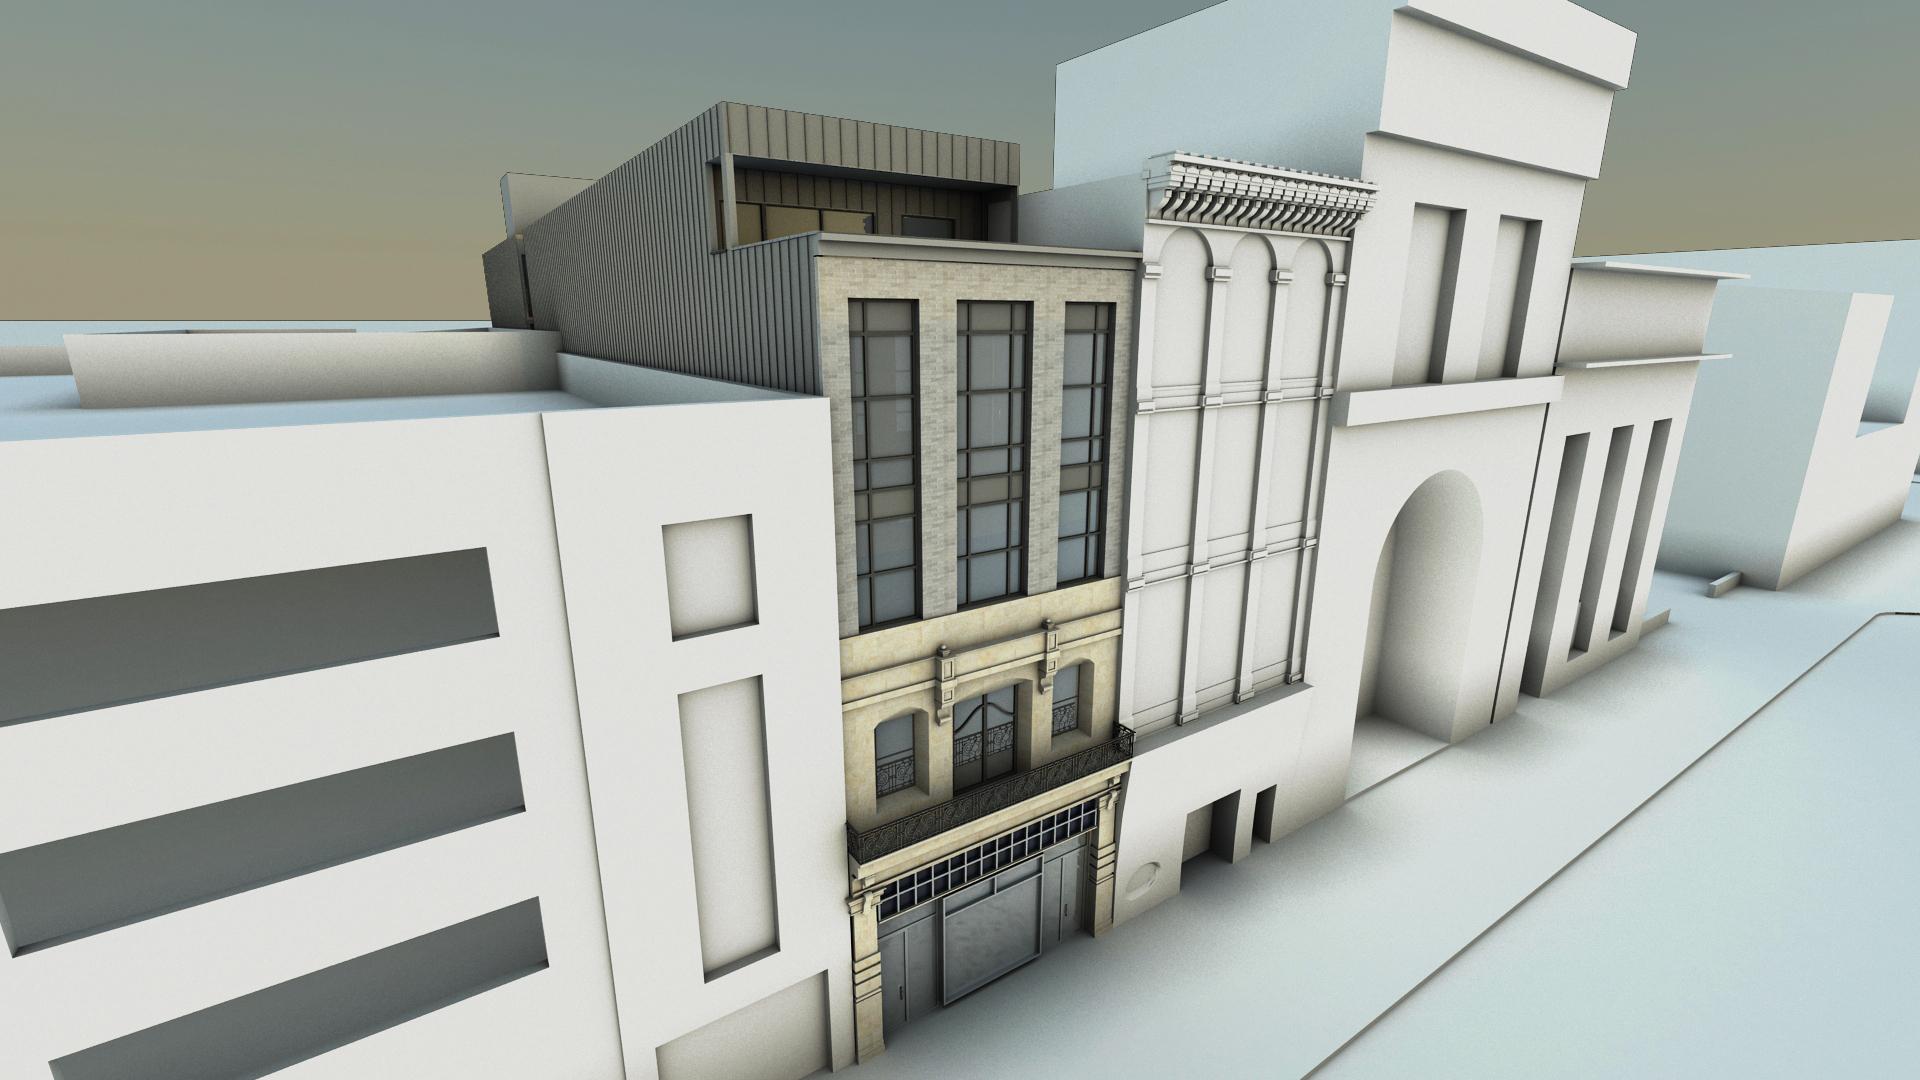 New life for the philadelphia blueprint company on chestnut street rendering of 725 chestnut street via urban space development inc malvernweather Image collections